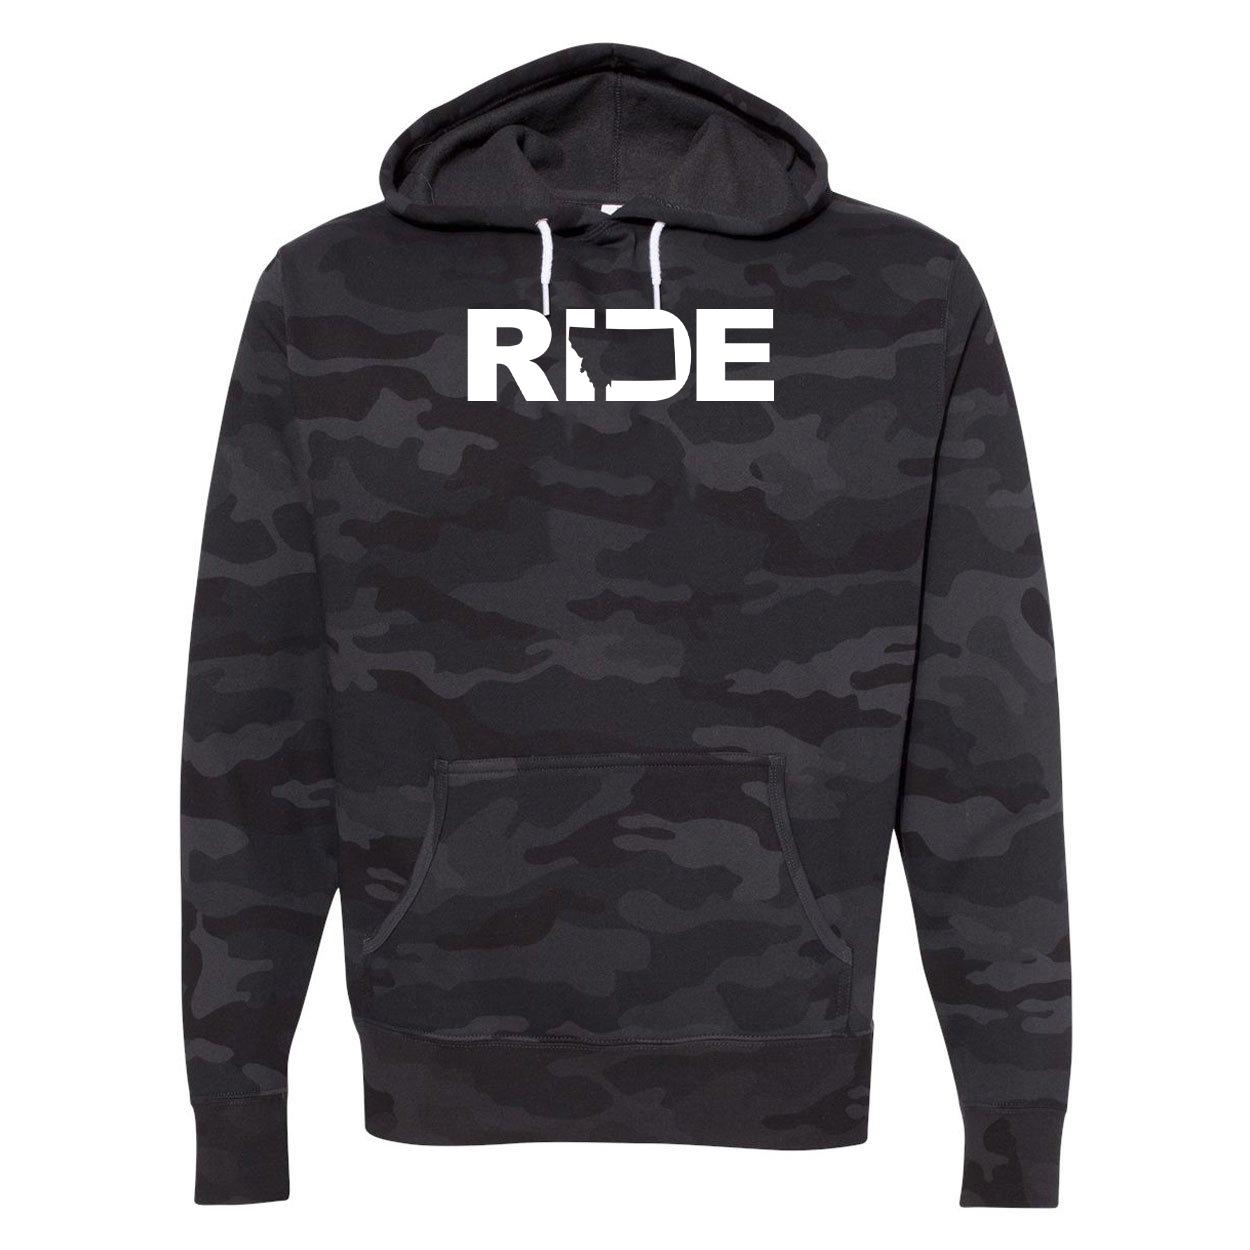 Ride Montana Classic Unisex Hooded Sweatshirt Black Camo (White Logo)